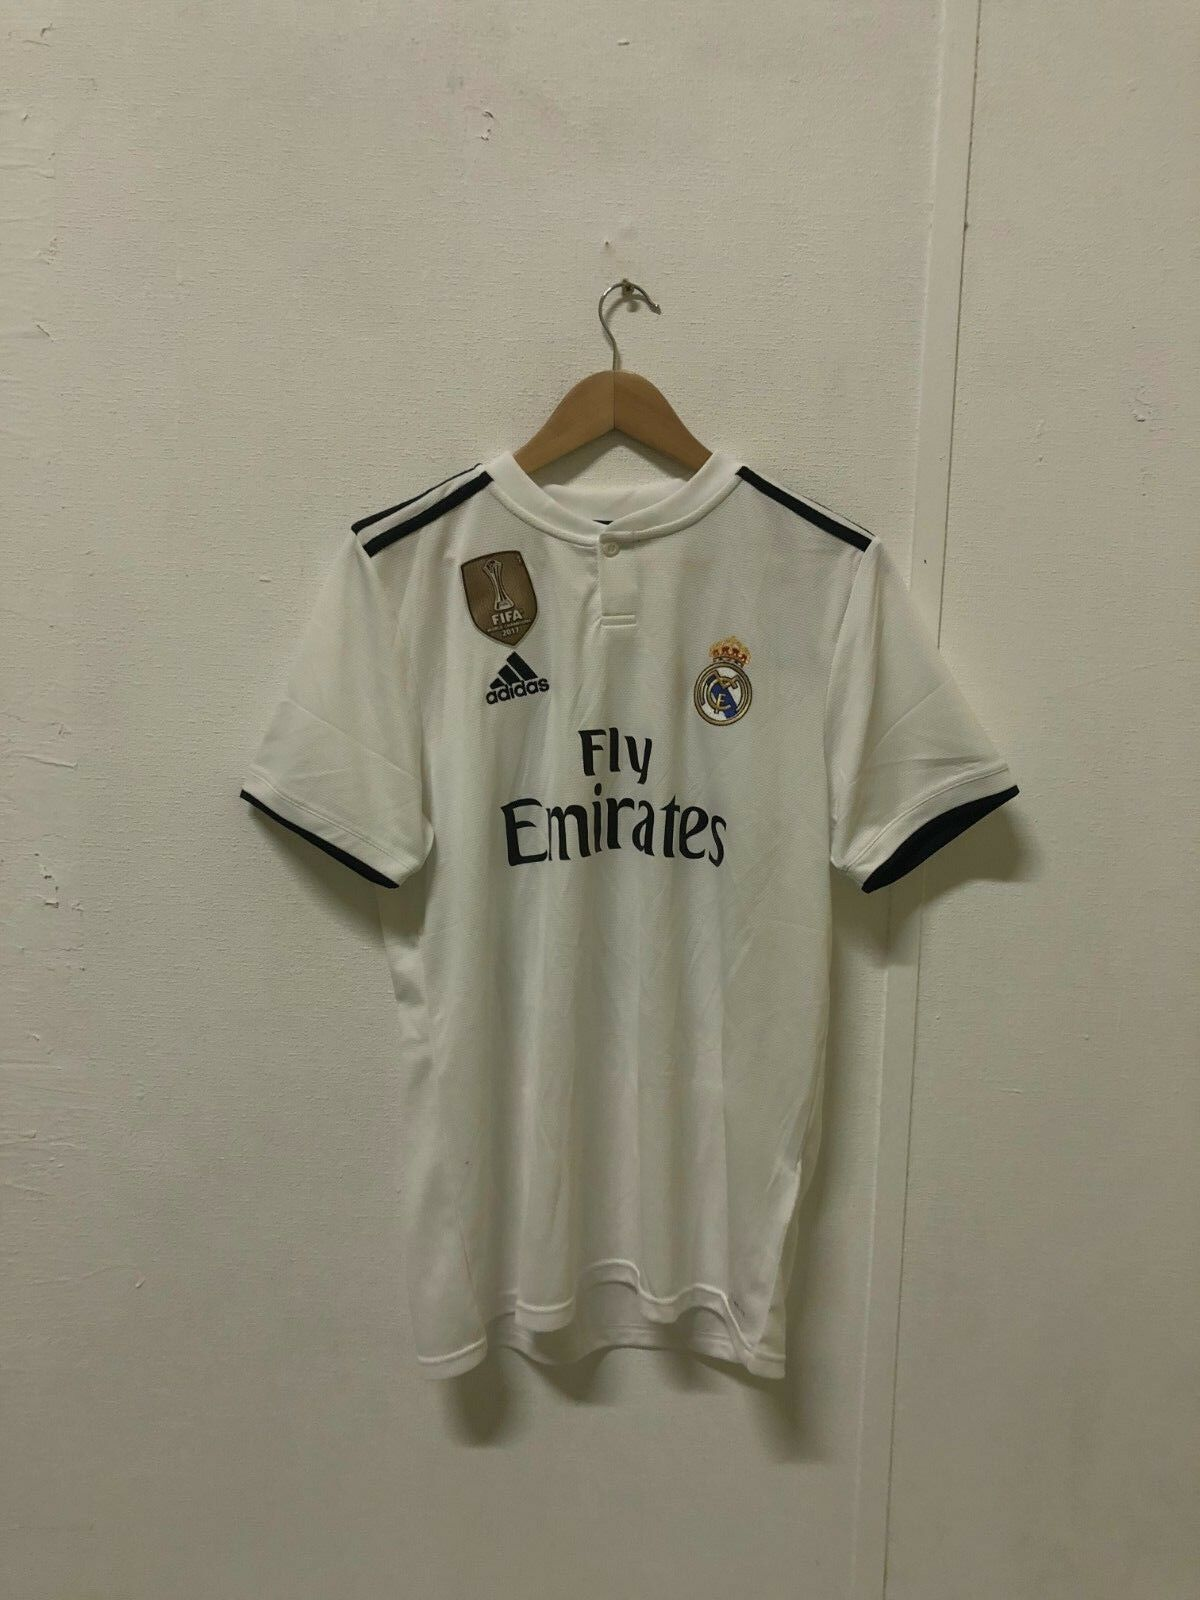 ADIDAS Homme Real Madrid 2018/19 Home Shirt-Medium-BALE Shirt-Medium-BALE Home 11-blanc-Neuf 171718